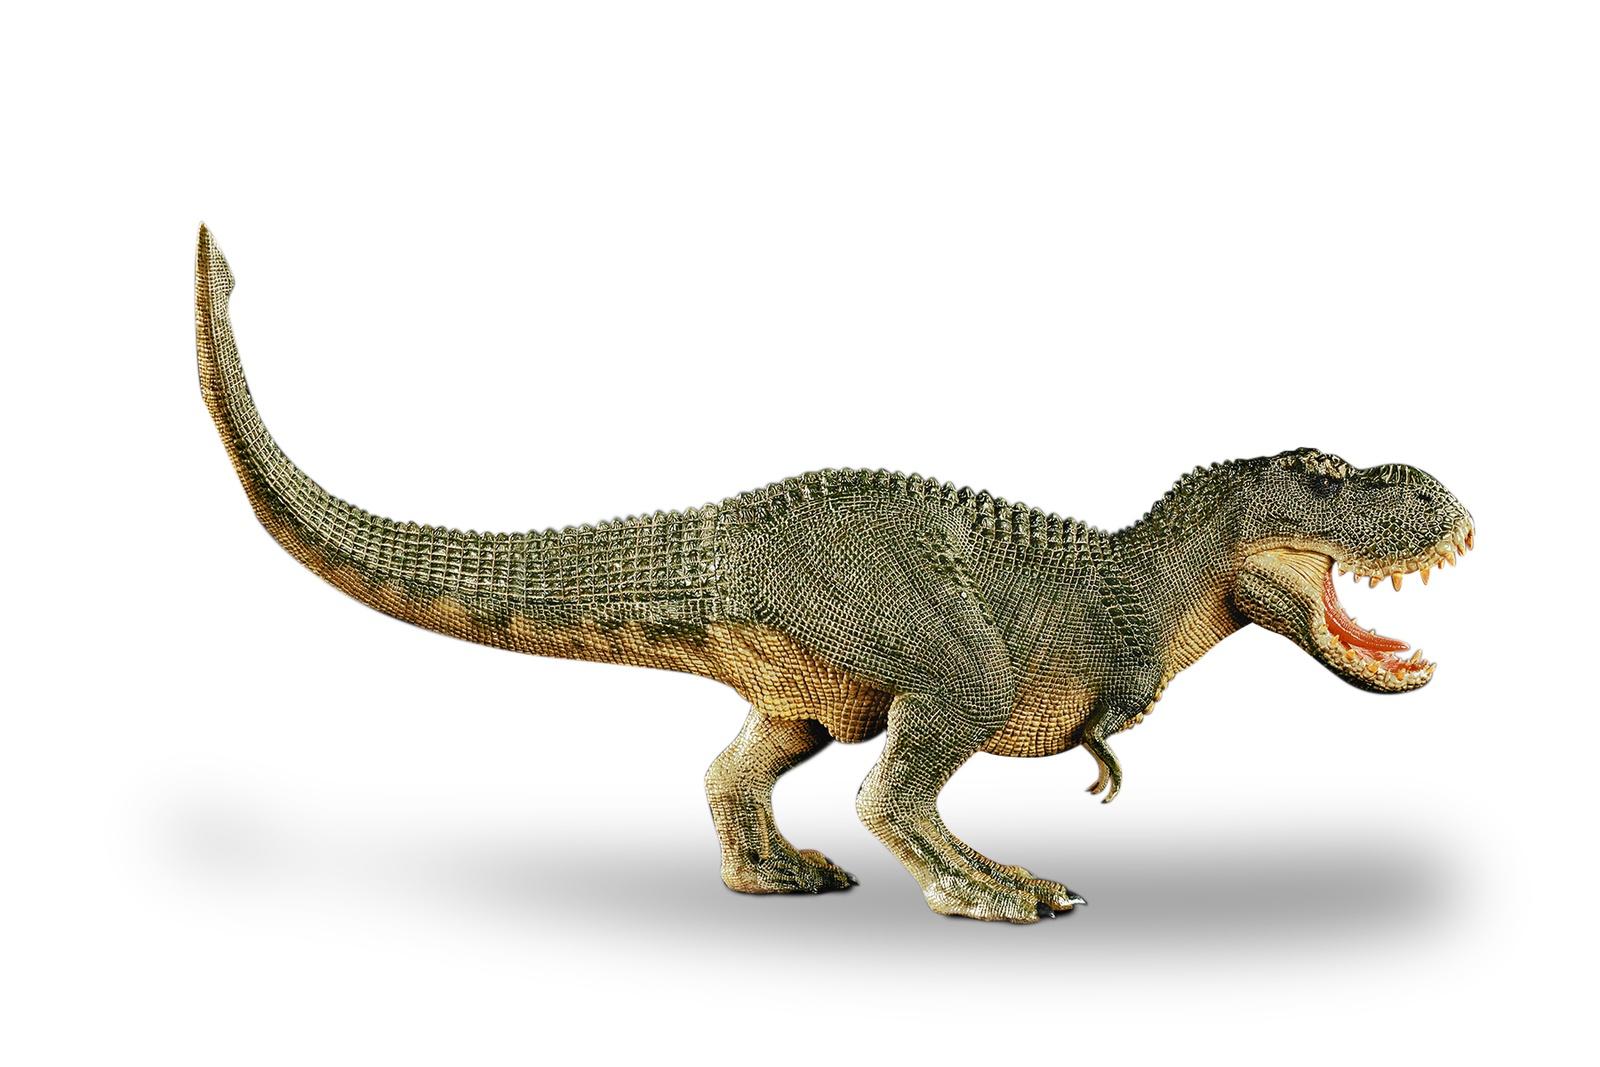 Фигурка REBOR 160437 динозавр Тираннозавр (T-rex Vanilla Ice Jungle) 1:35